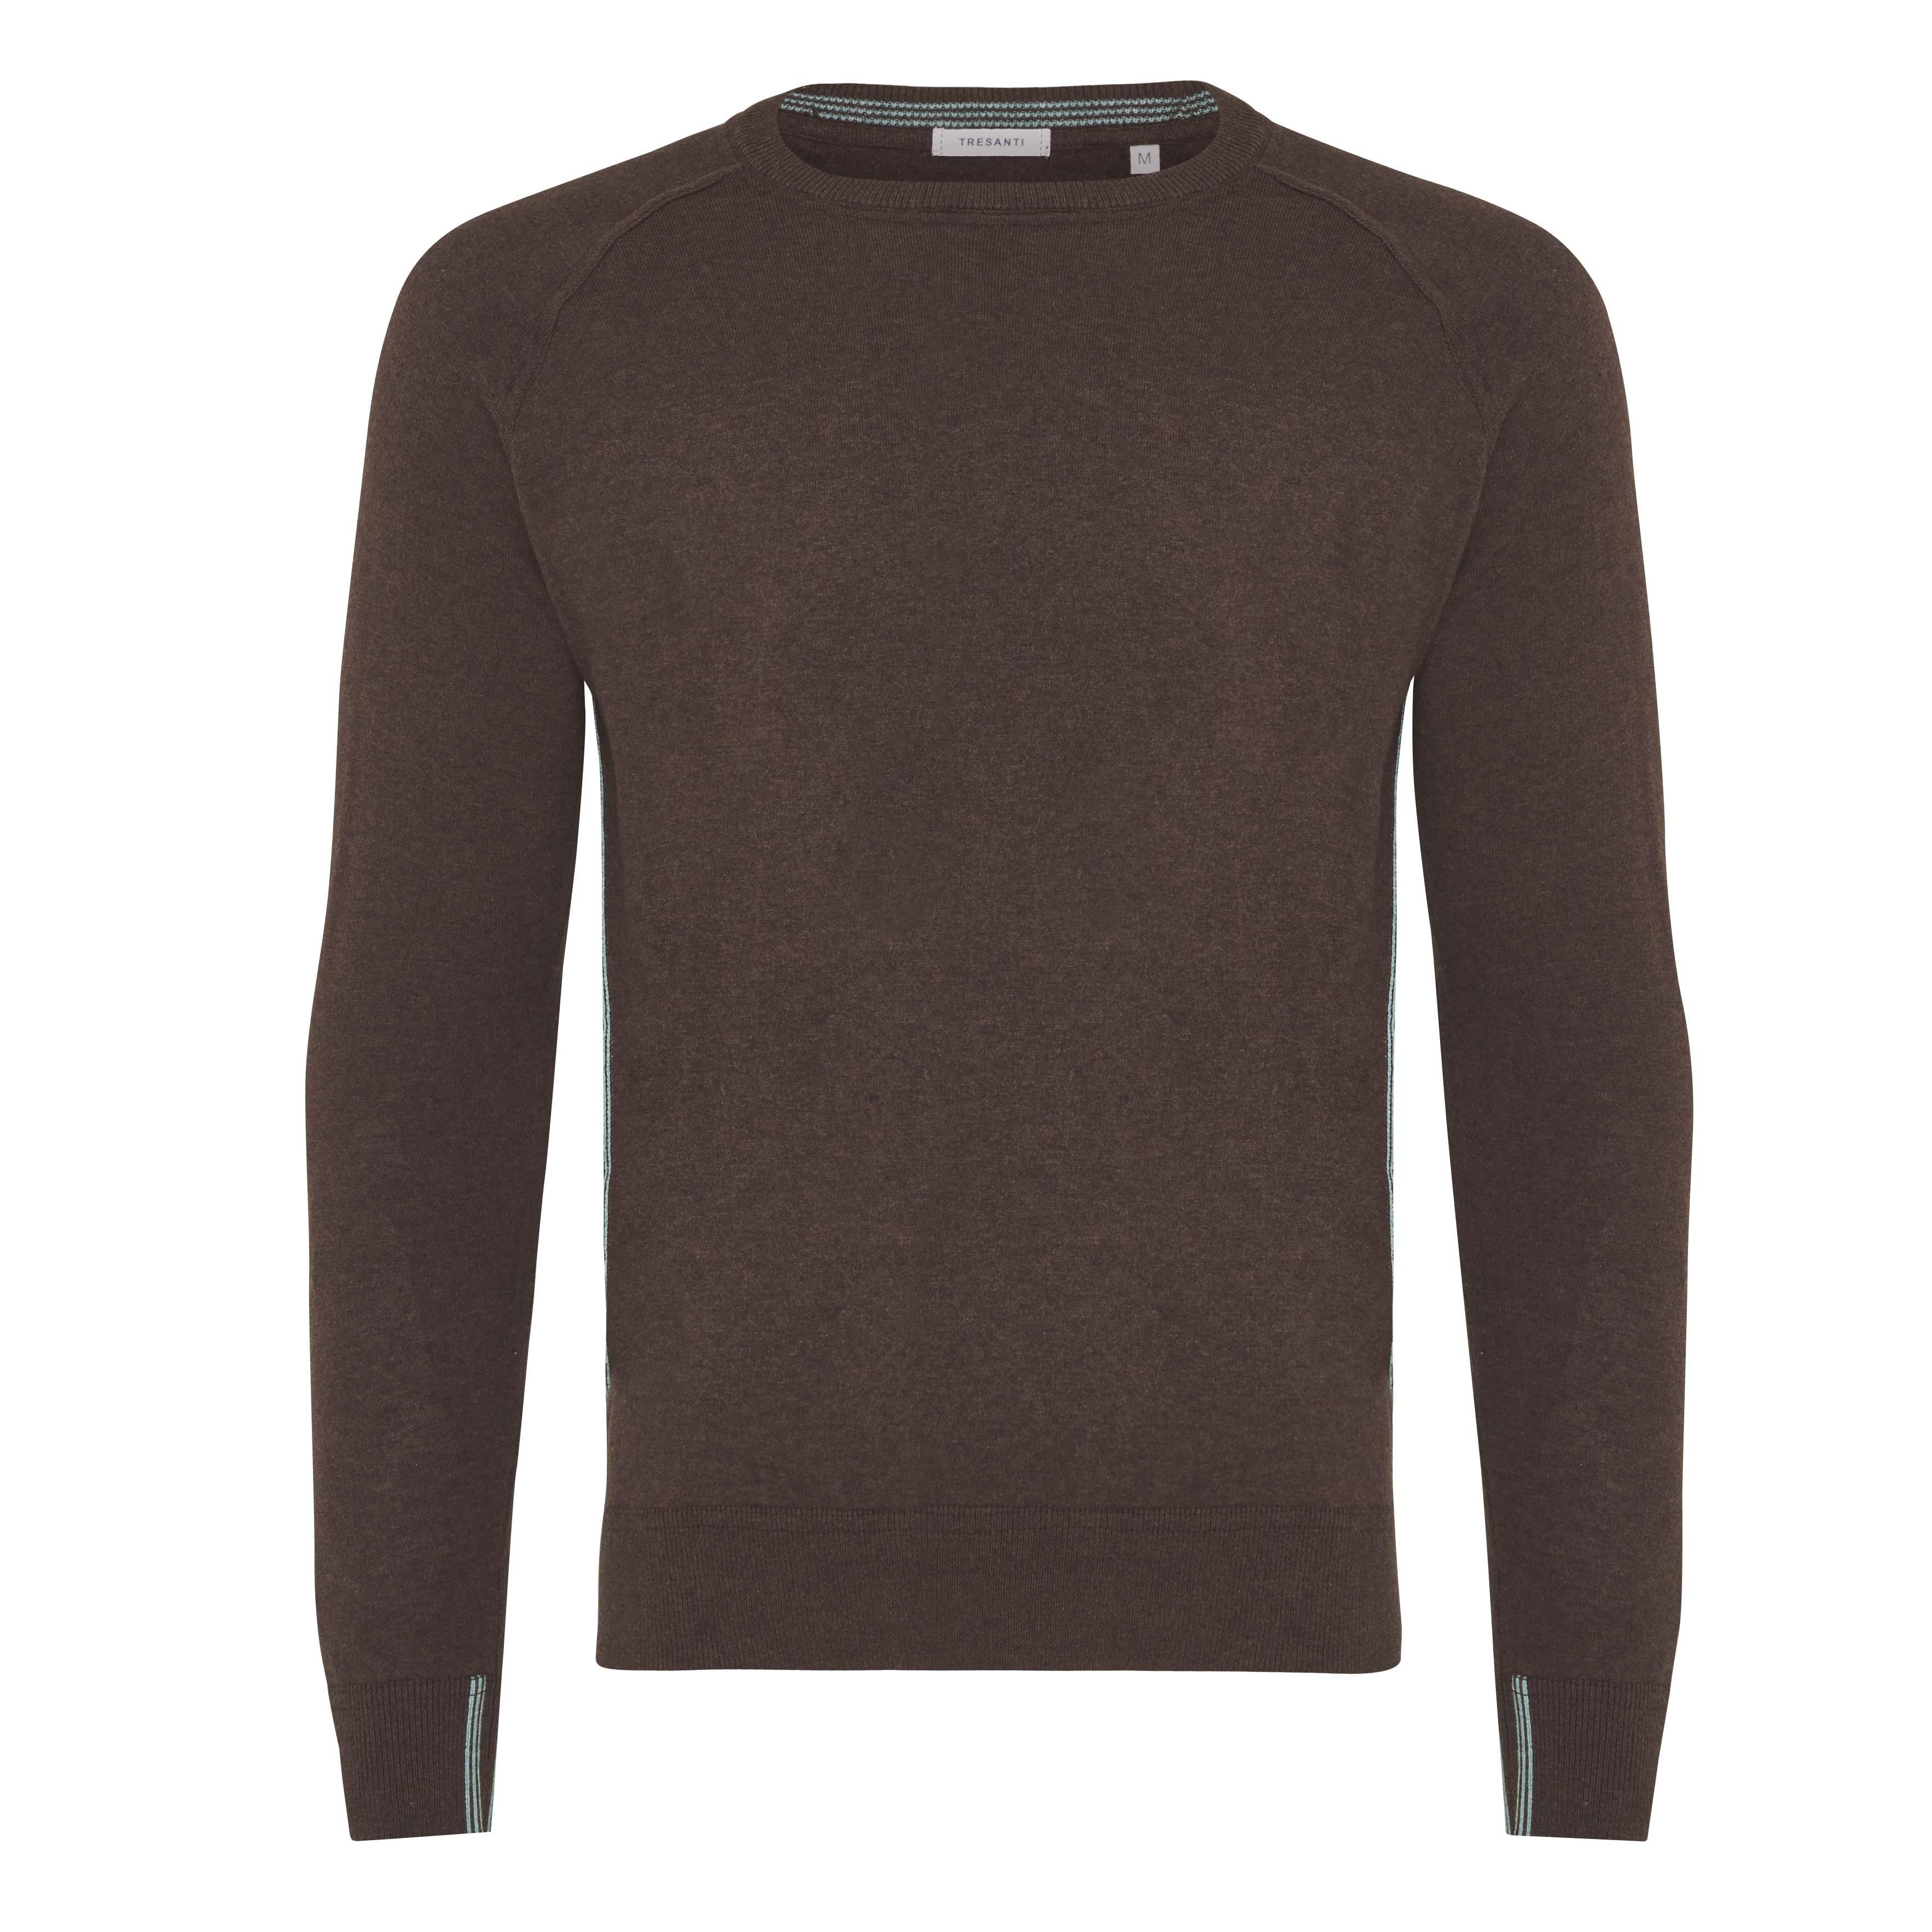 James | Pullover raglan brown